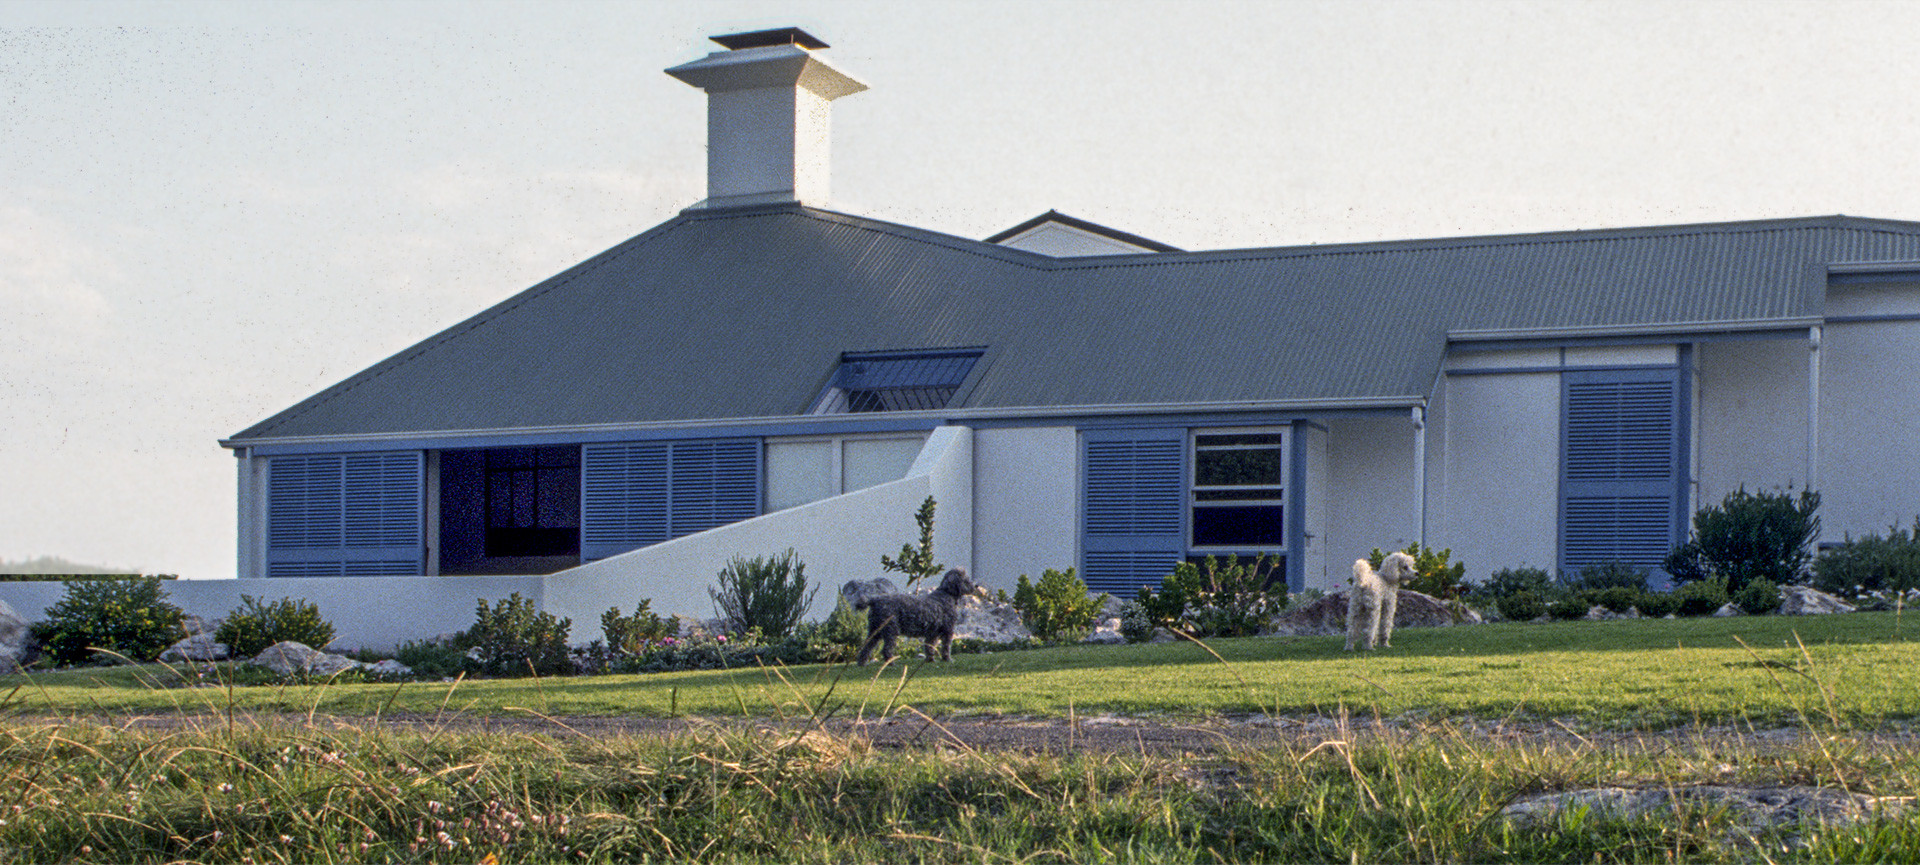 Swanepoel Holiday House